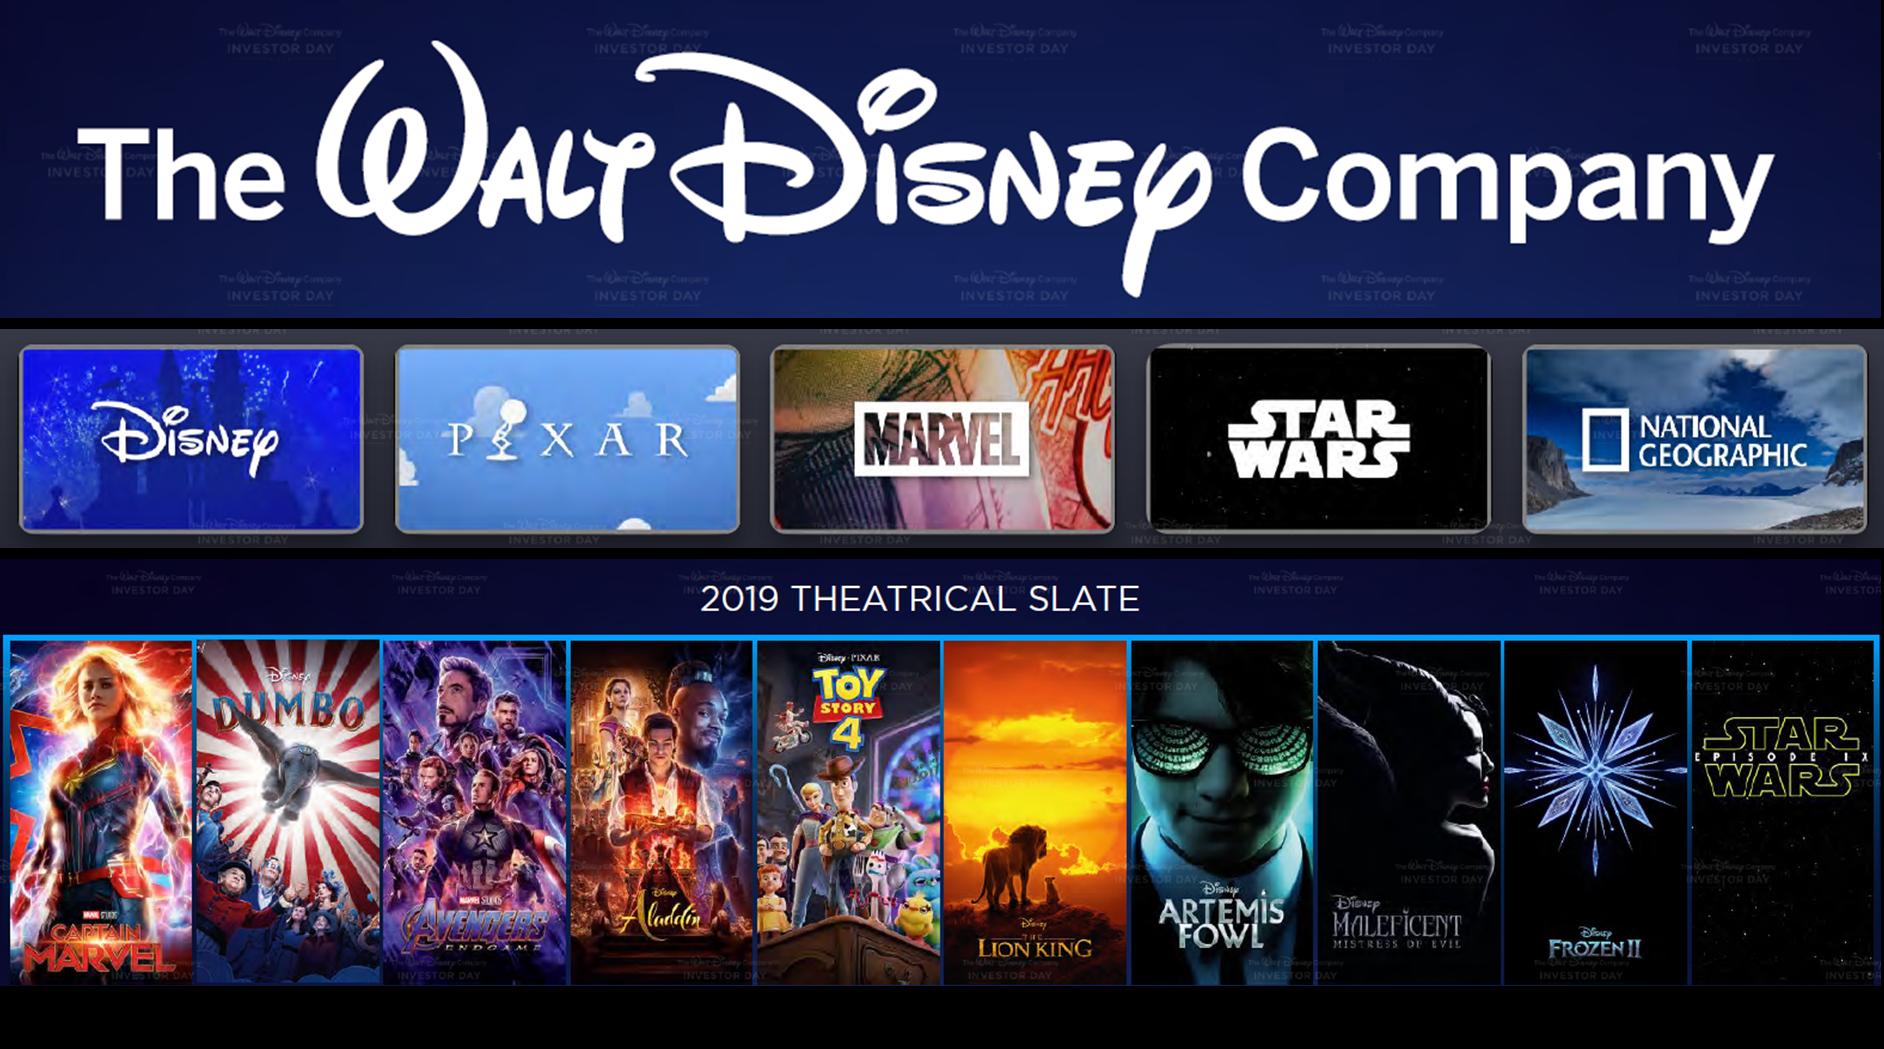 Netflix has a 13 year head start - can Disney still succeed